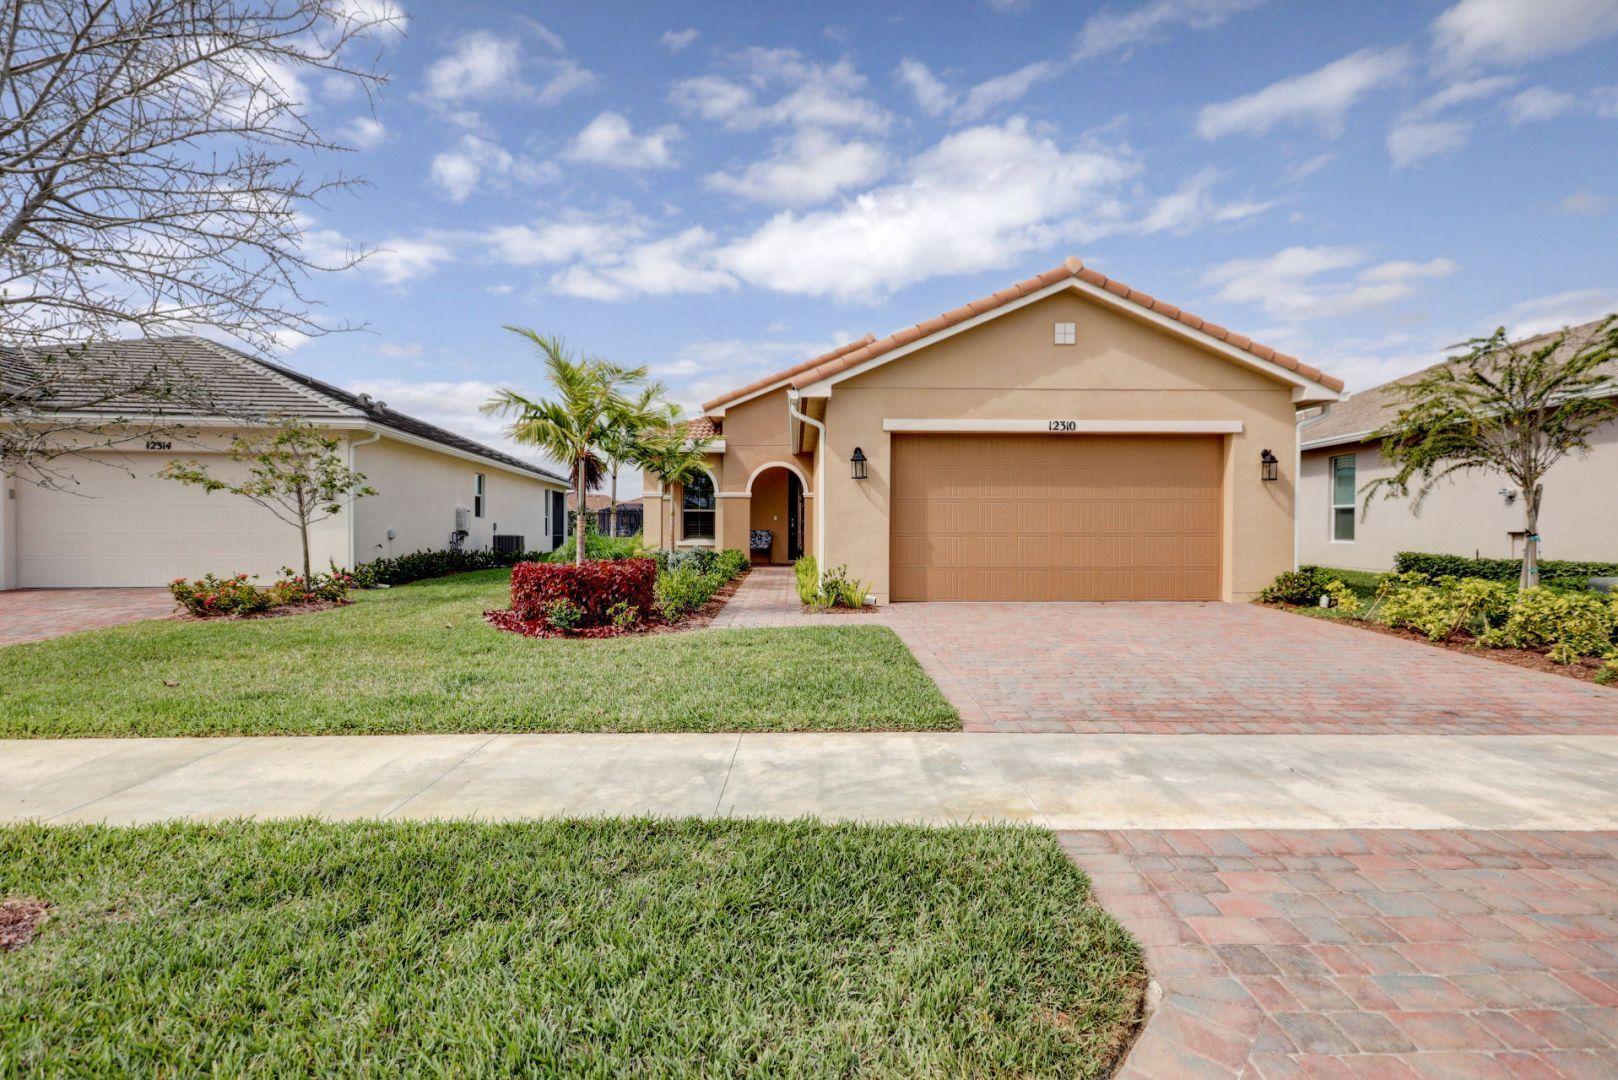 Port Saint Lucie Homes for Sale -  Waterfront,  12310 SW Silverwood Avenue